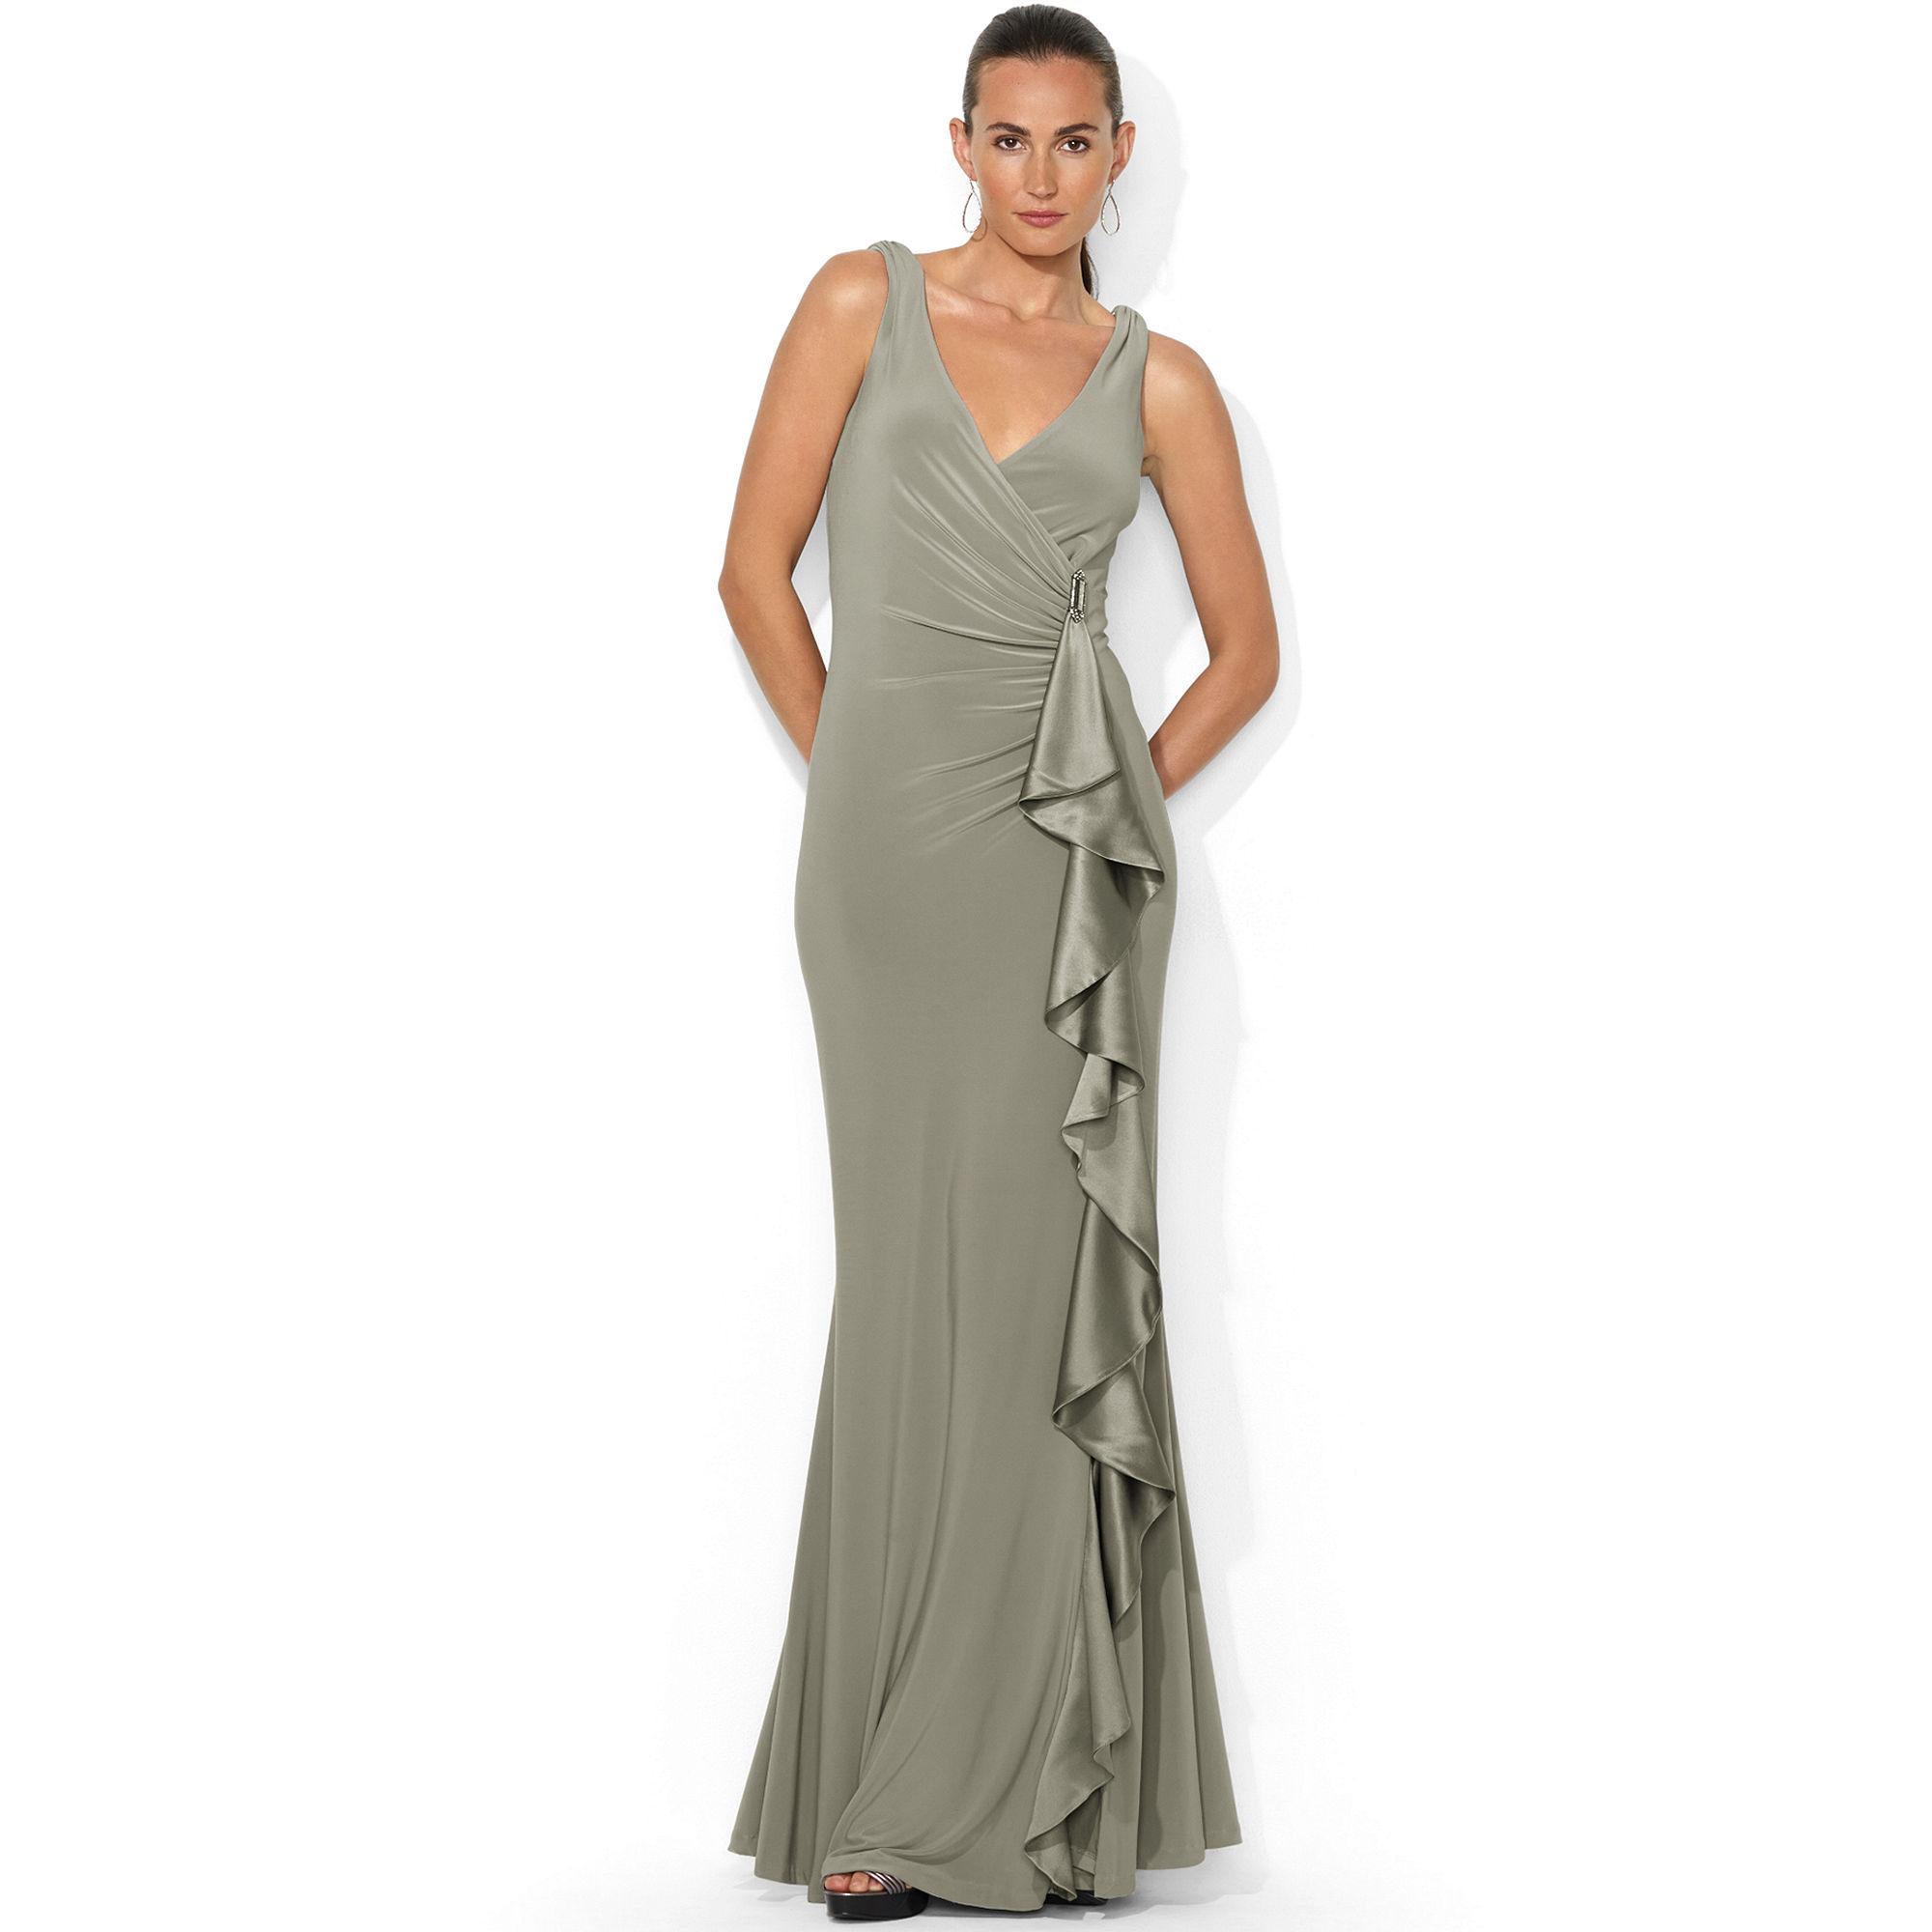 24b04289b6948 Lyst - Lauren by Ralph Lauren Sleeveless Ruched Ruffled Gown in Gray